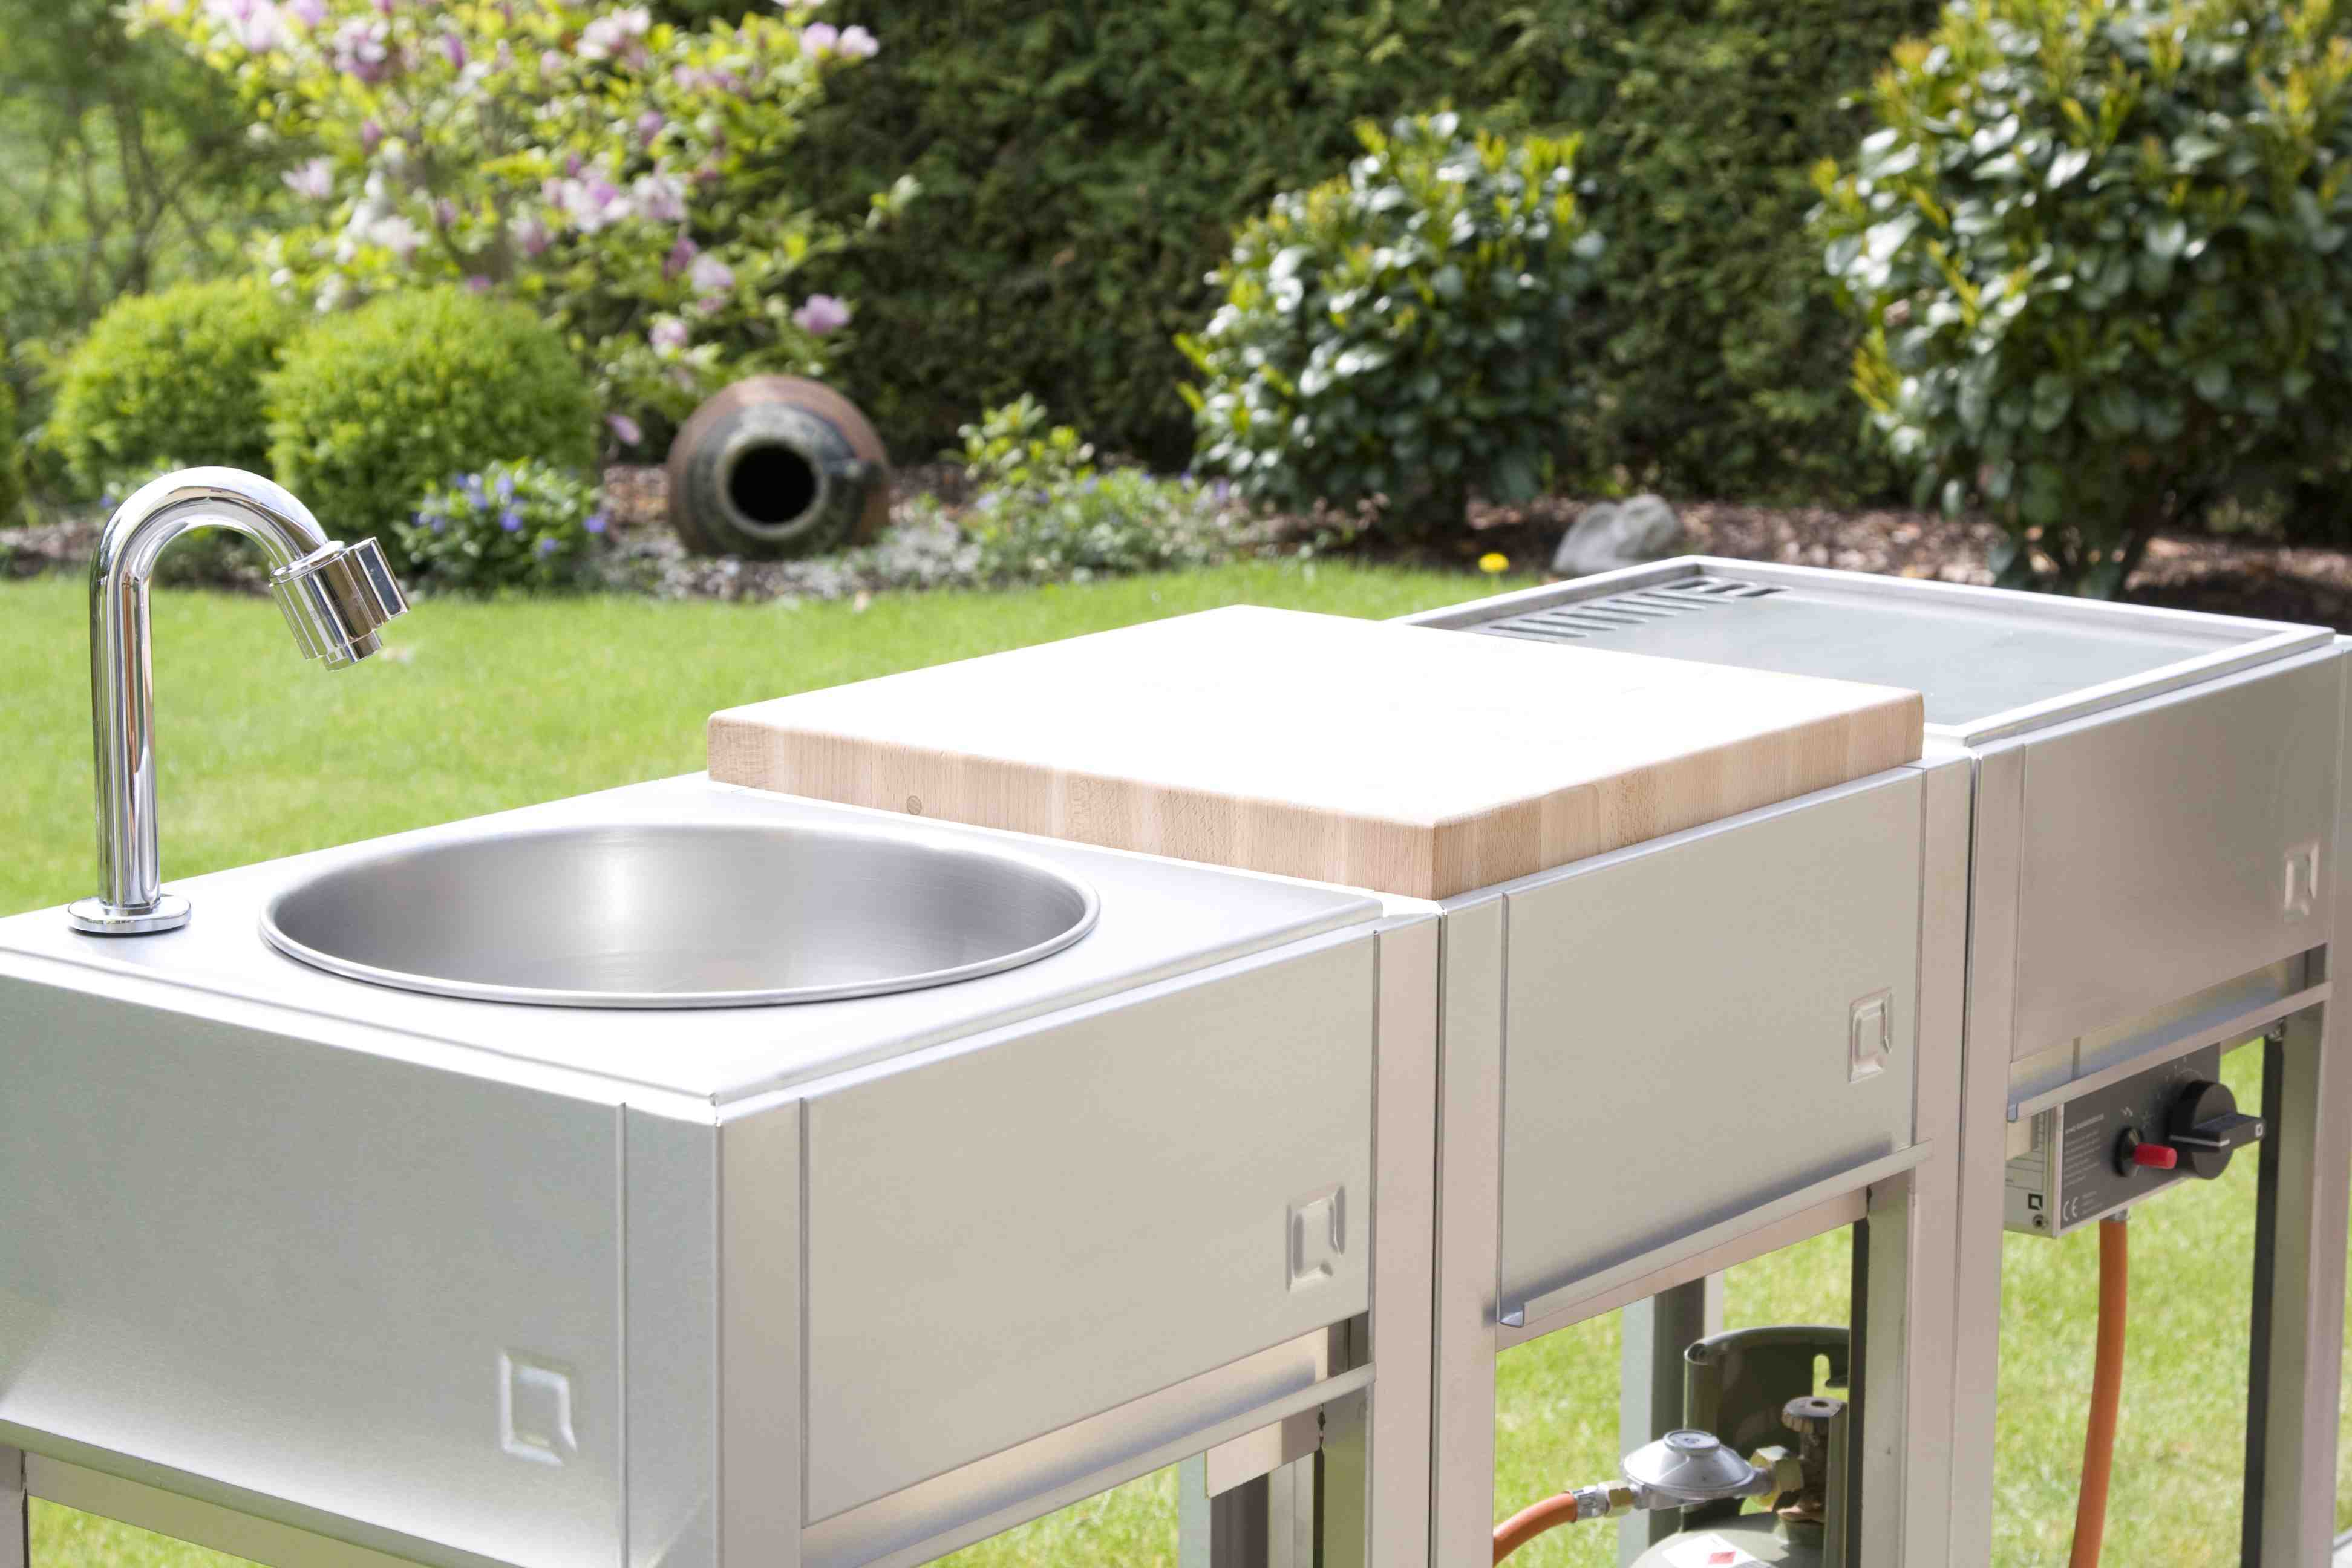 Outdoor Küche Edelstahl Zubehör : Oneq smart outdoor cooking outdoorküche bevemo